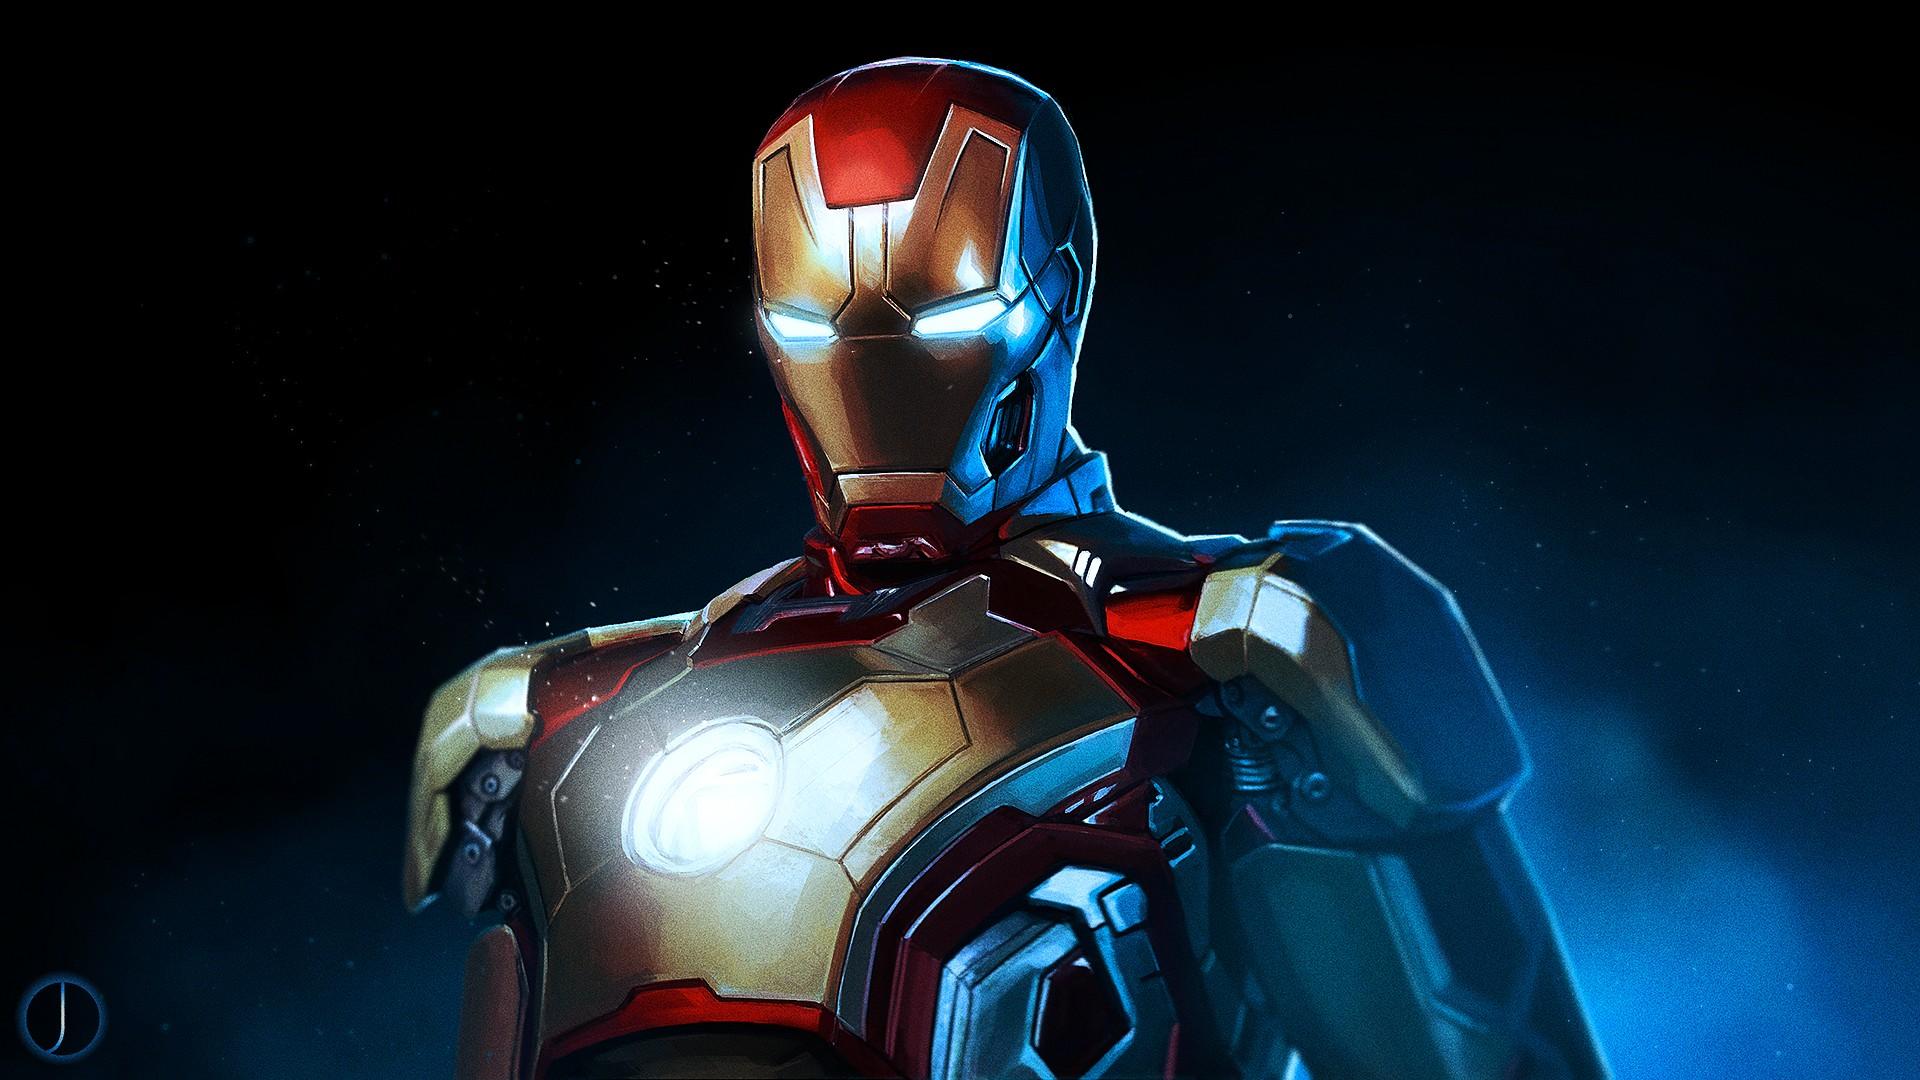 Iron man 3 wallpapers HD | PixelsTalk Net